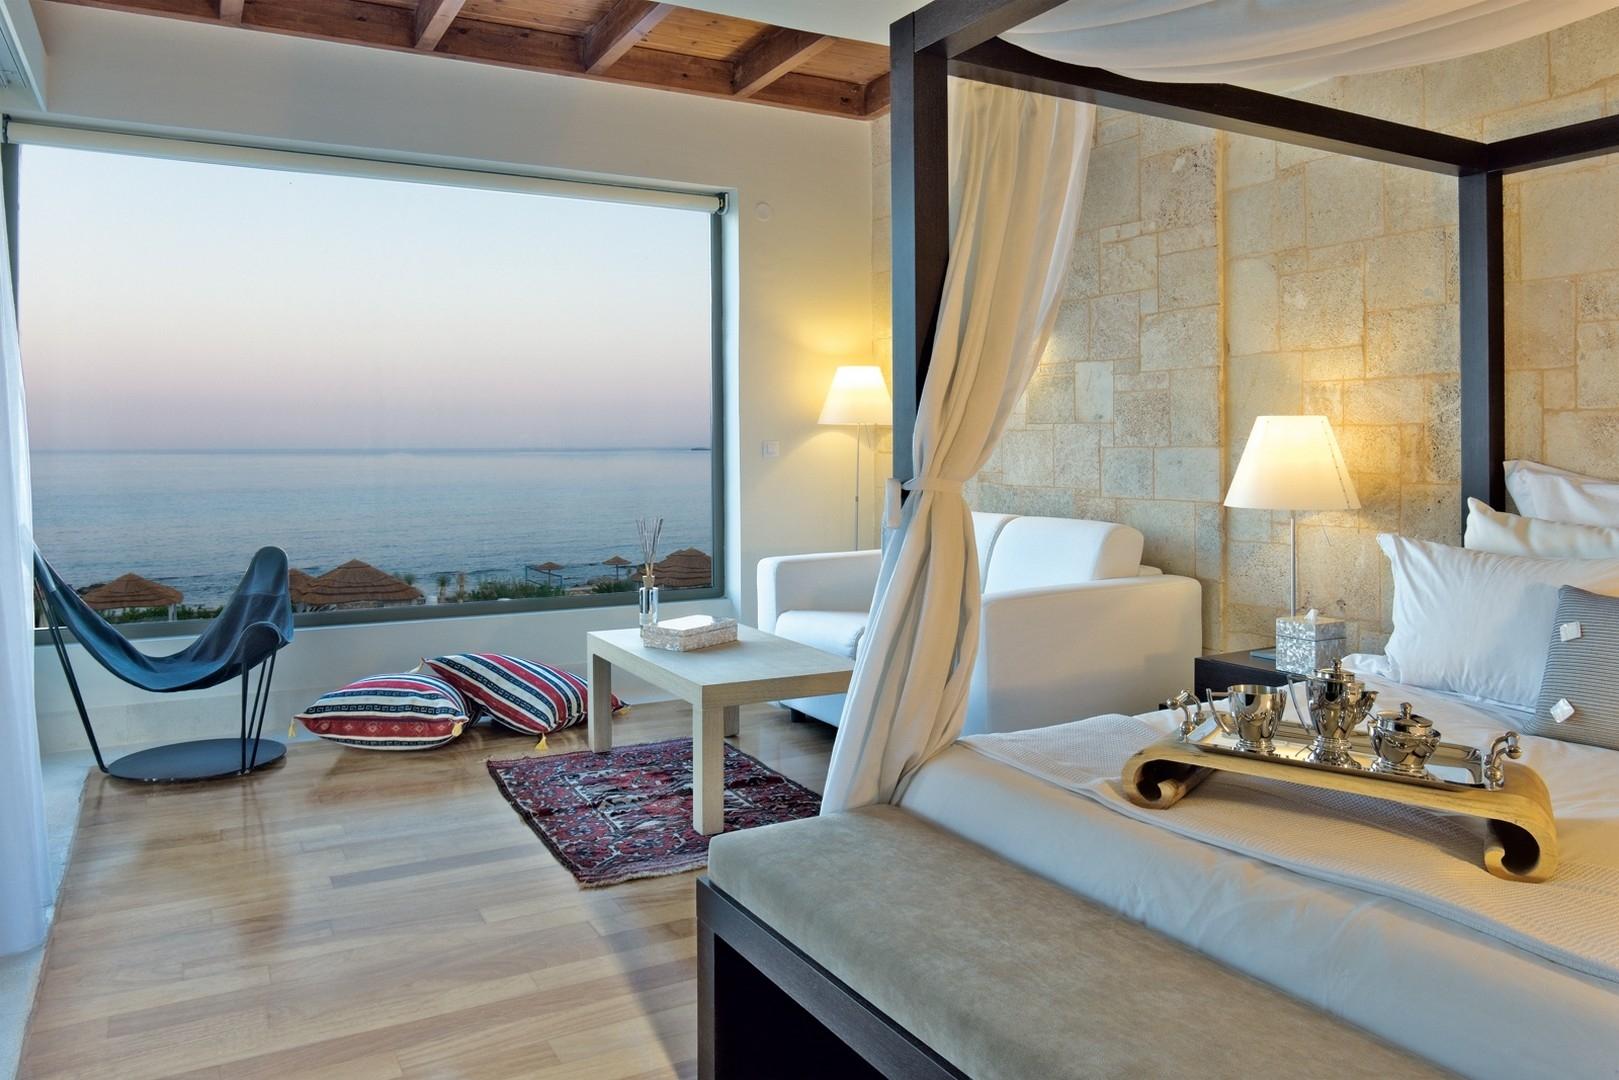 Aquagrand Luxury Hotel Lindos-Phodes.